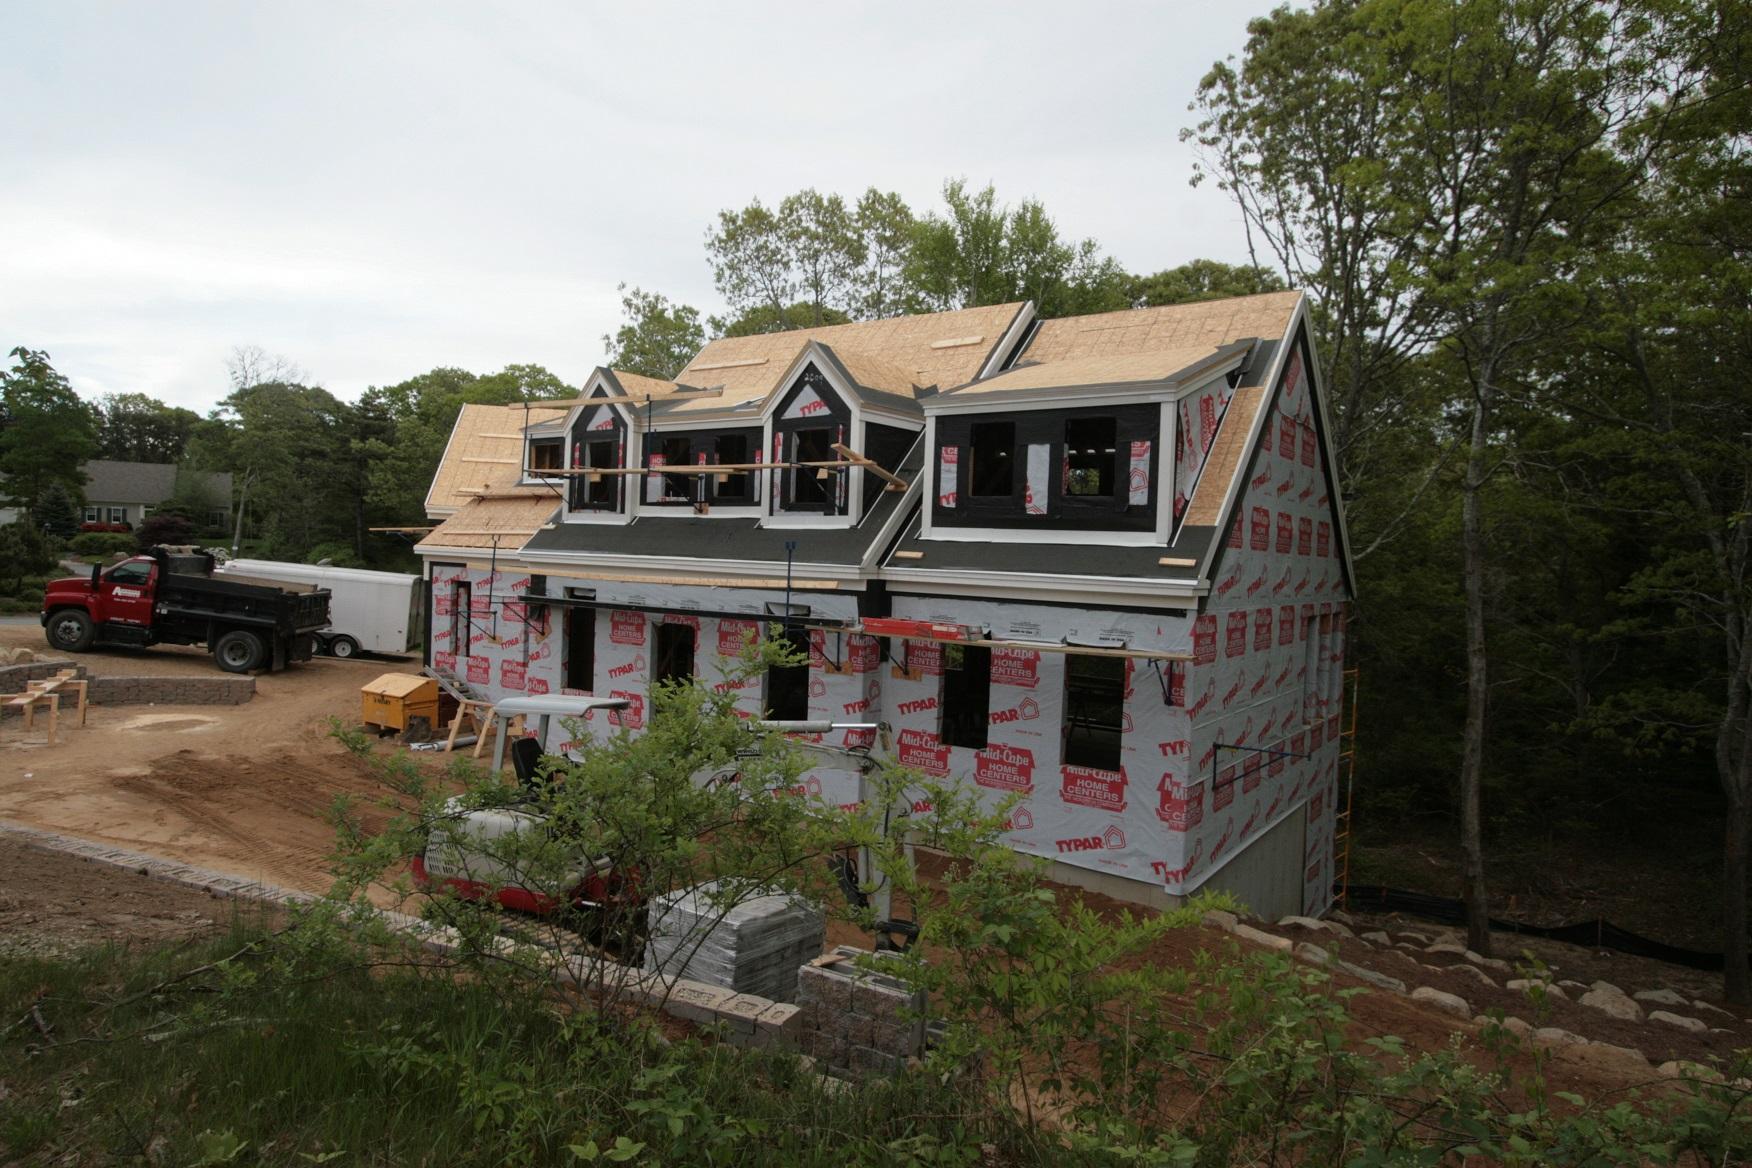 Holly Lane 7 Roof Up 9491.JPG